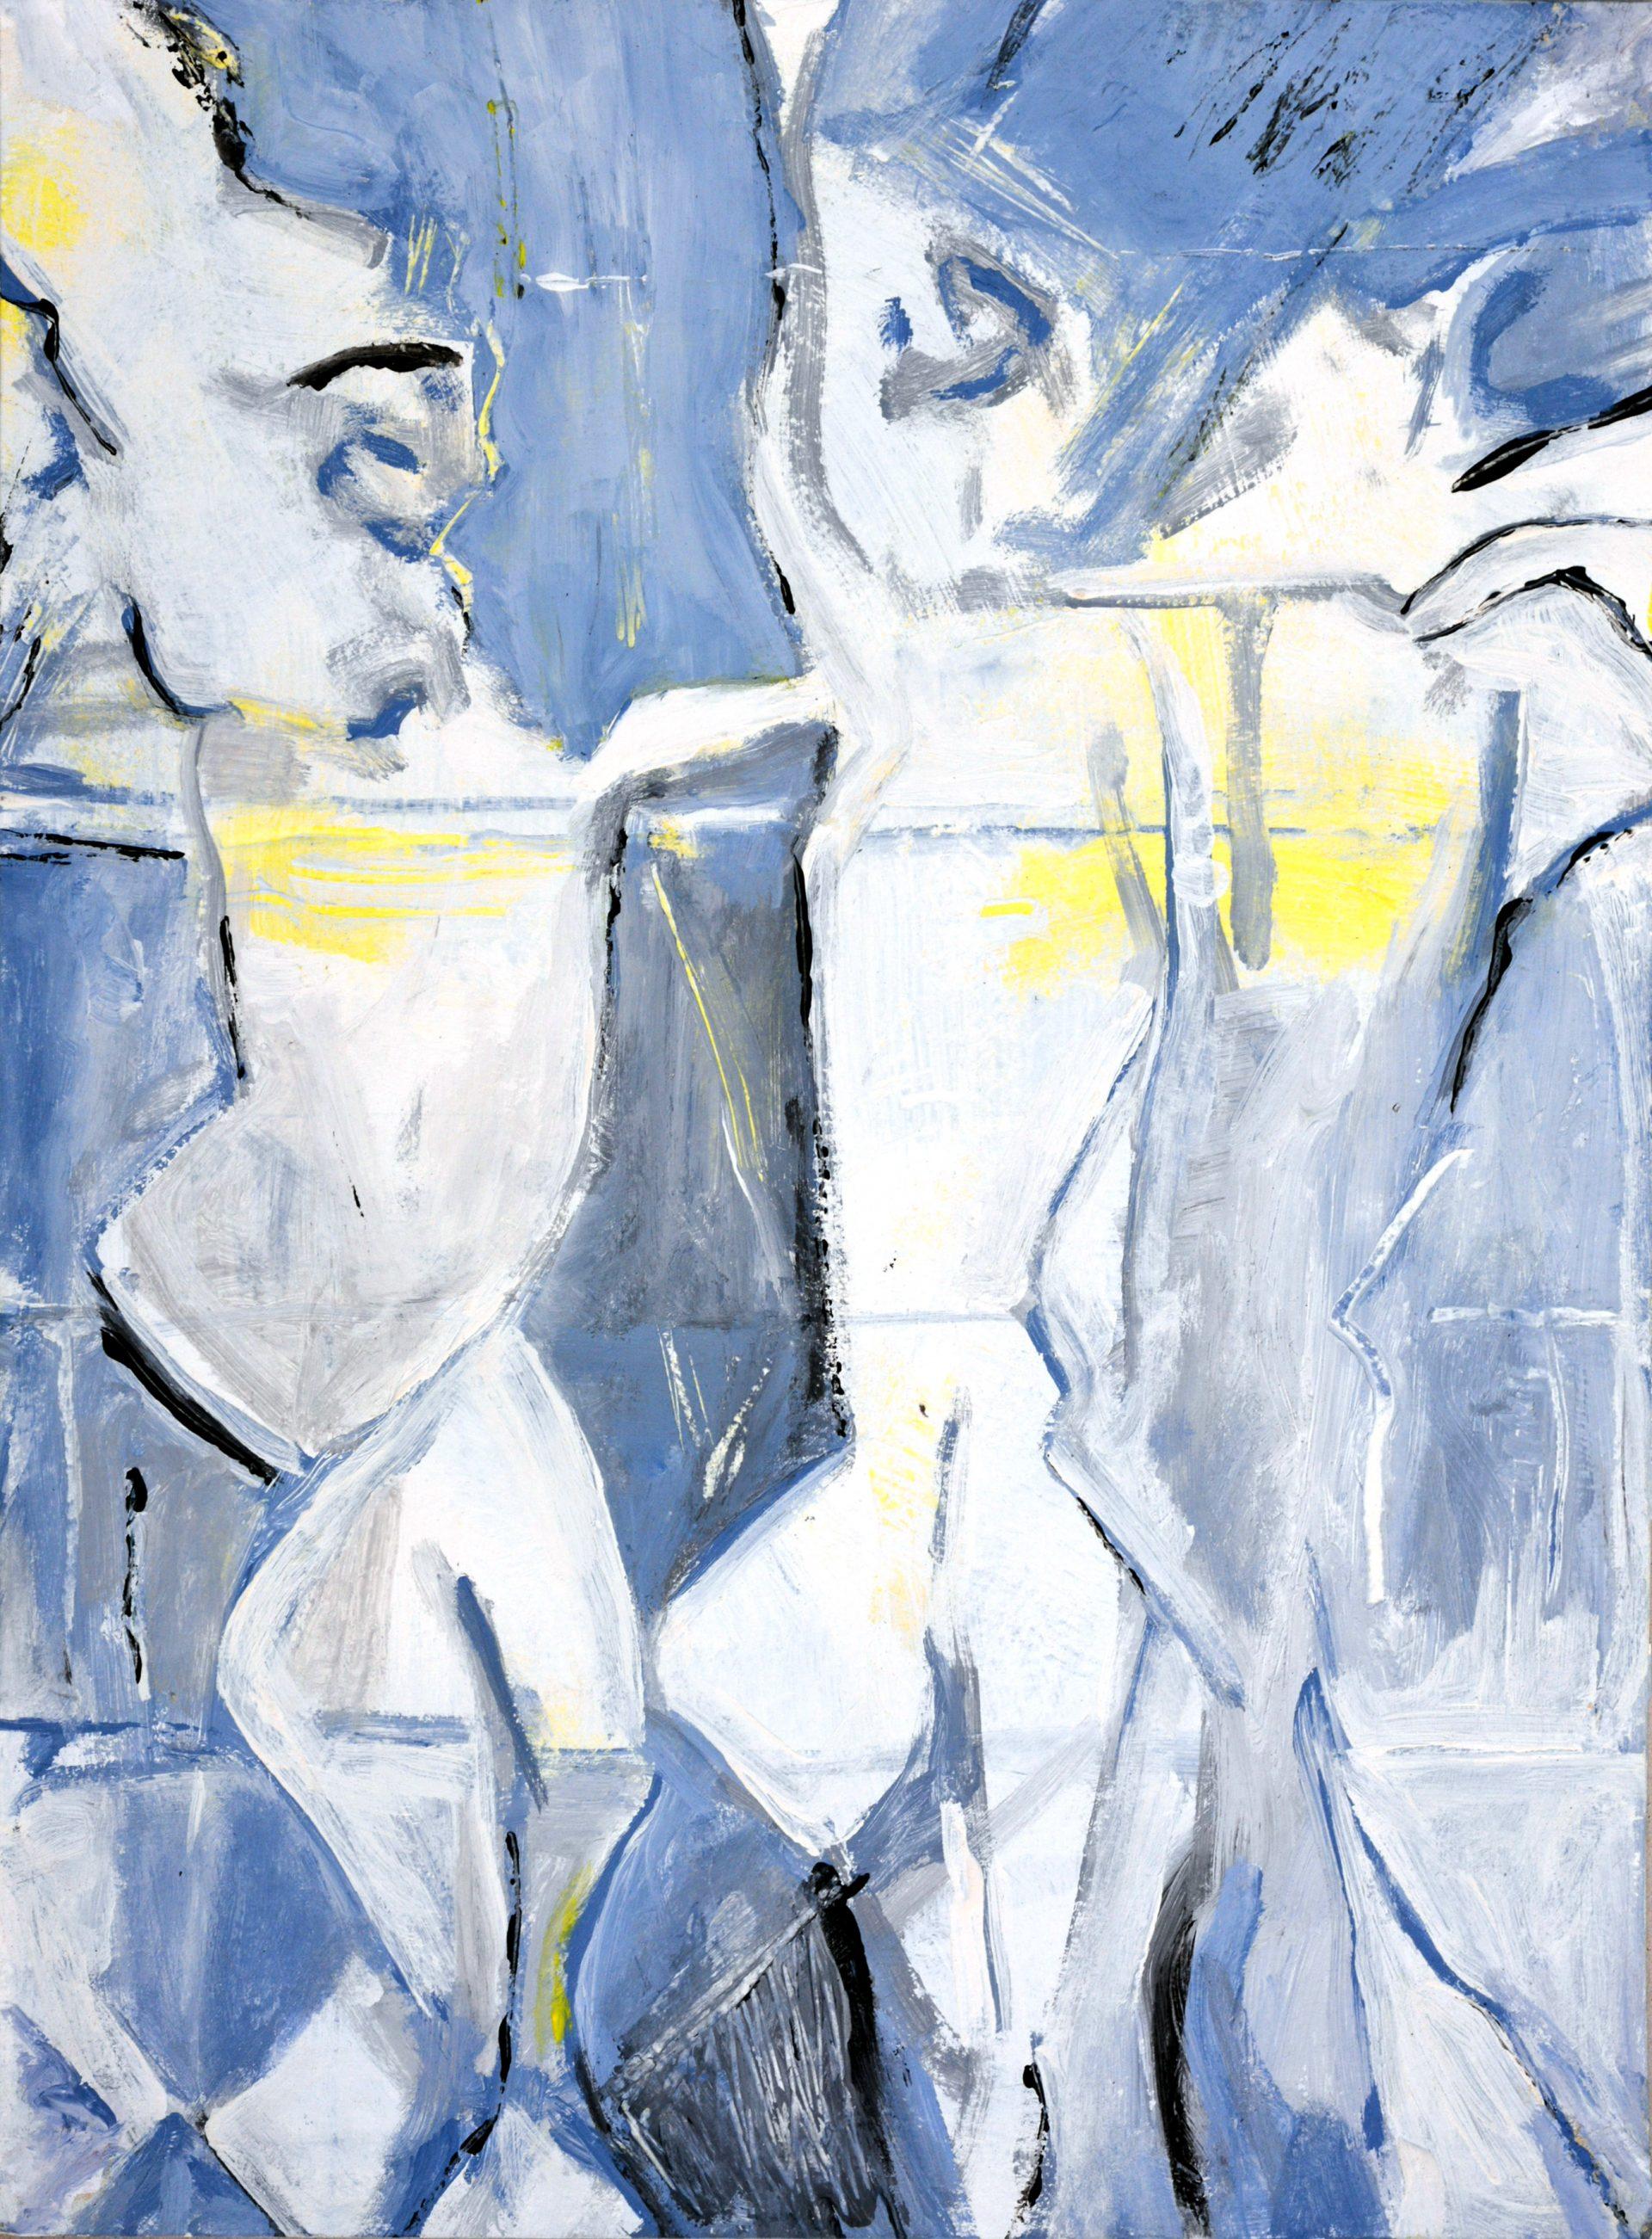 Danse bleue